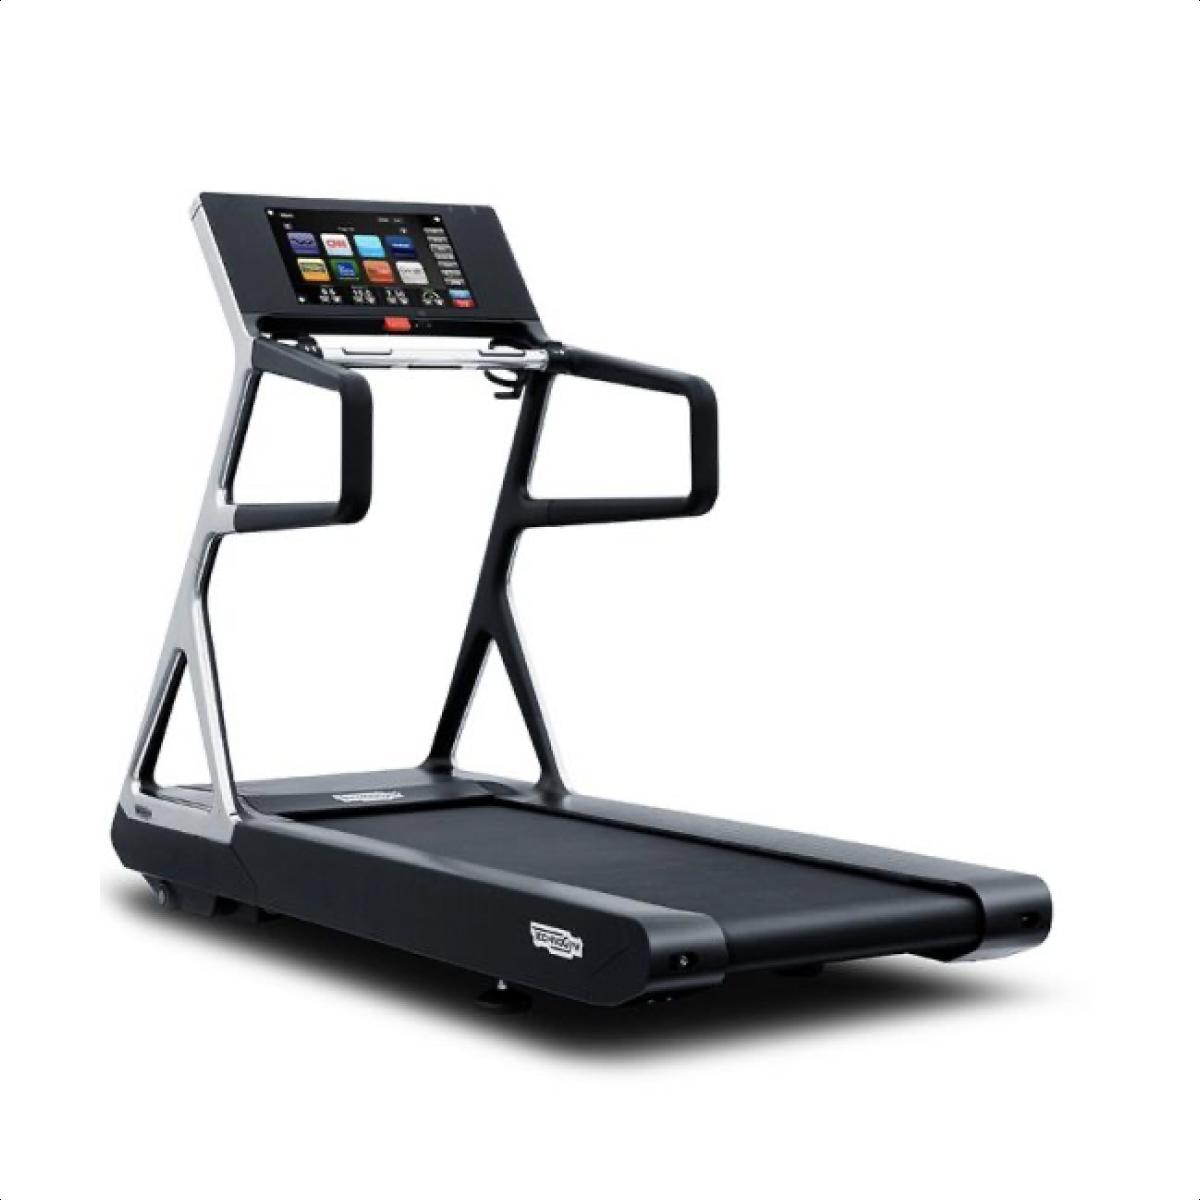 Treadmill Life Fitness T5